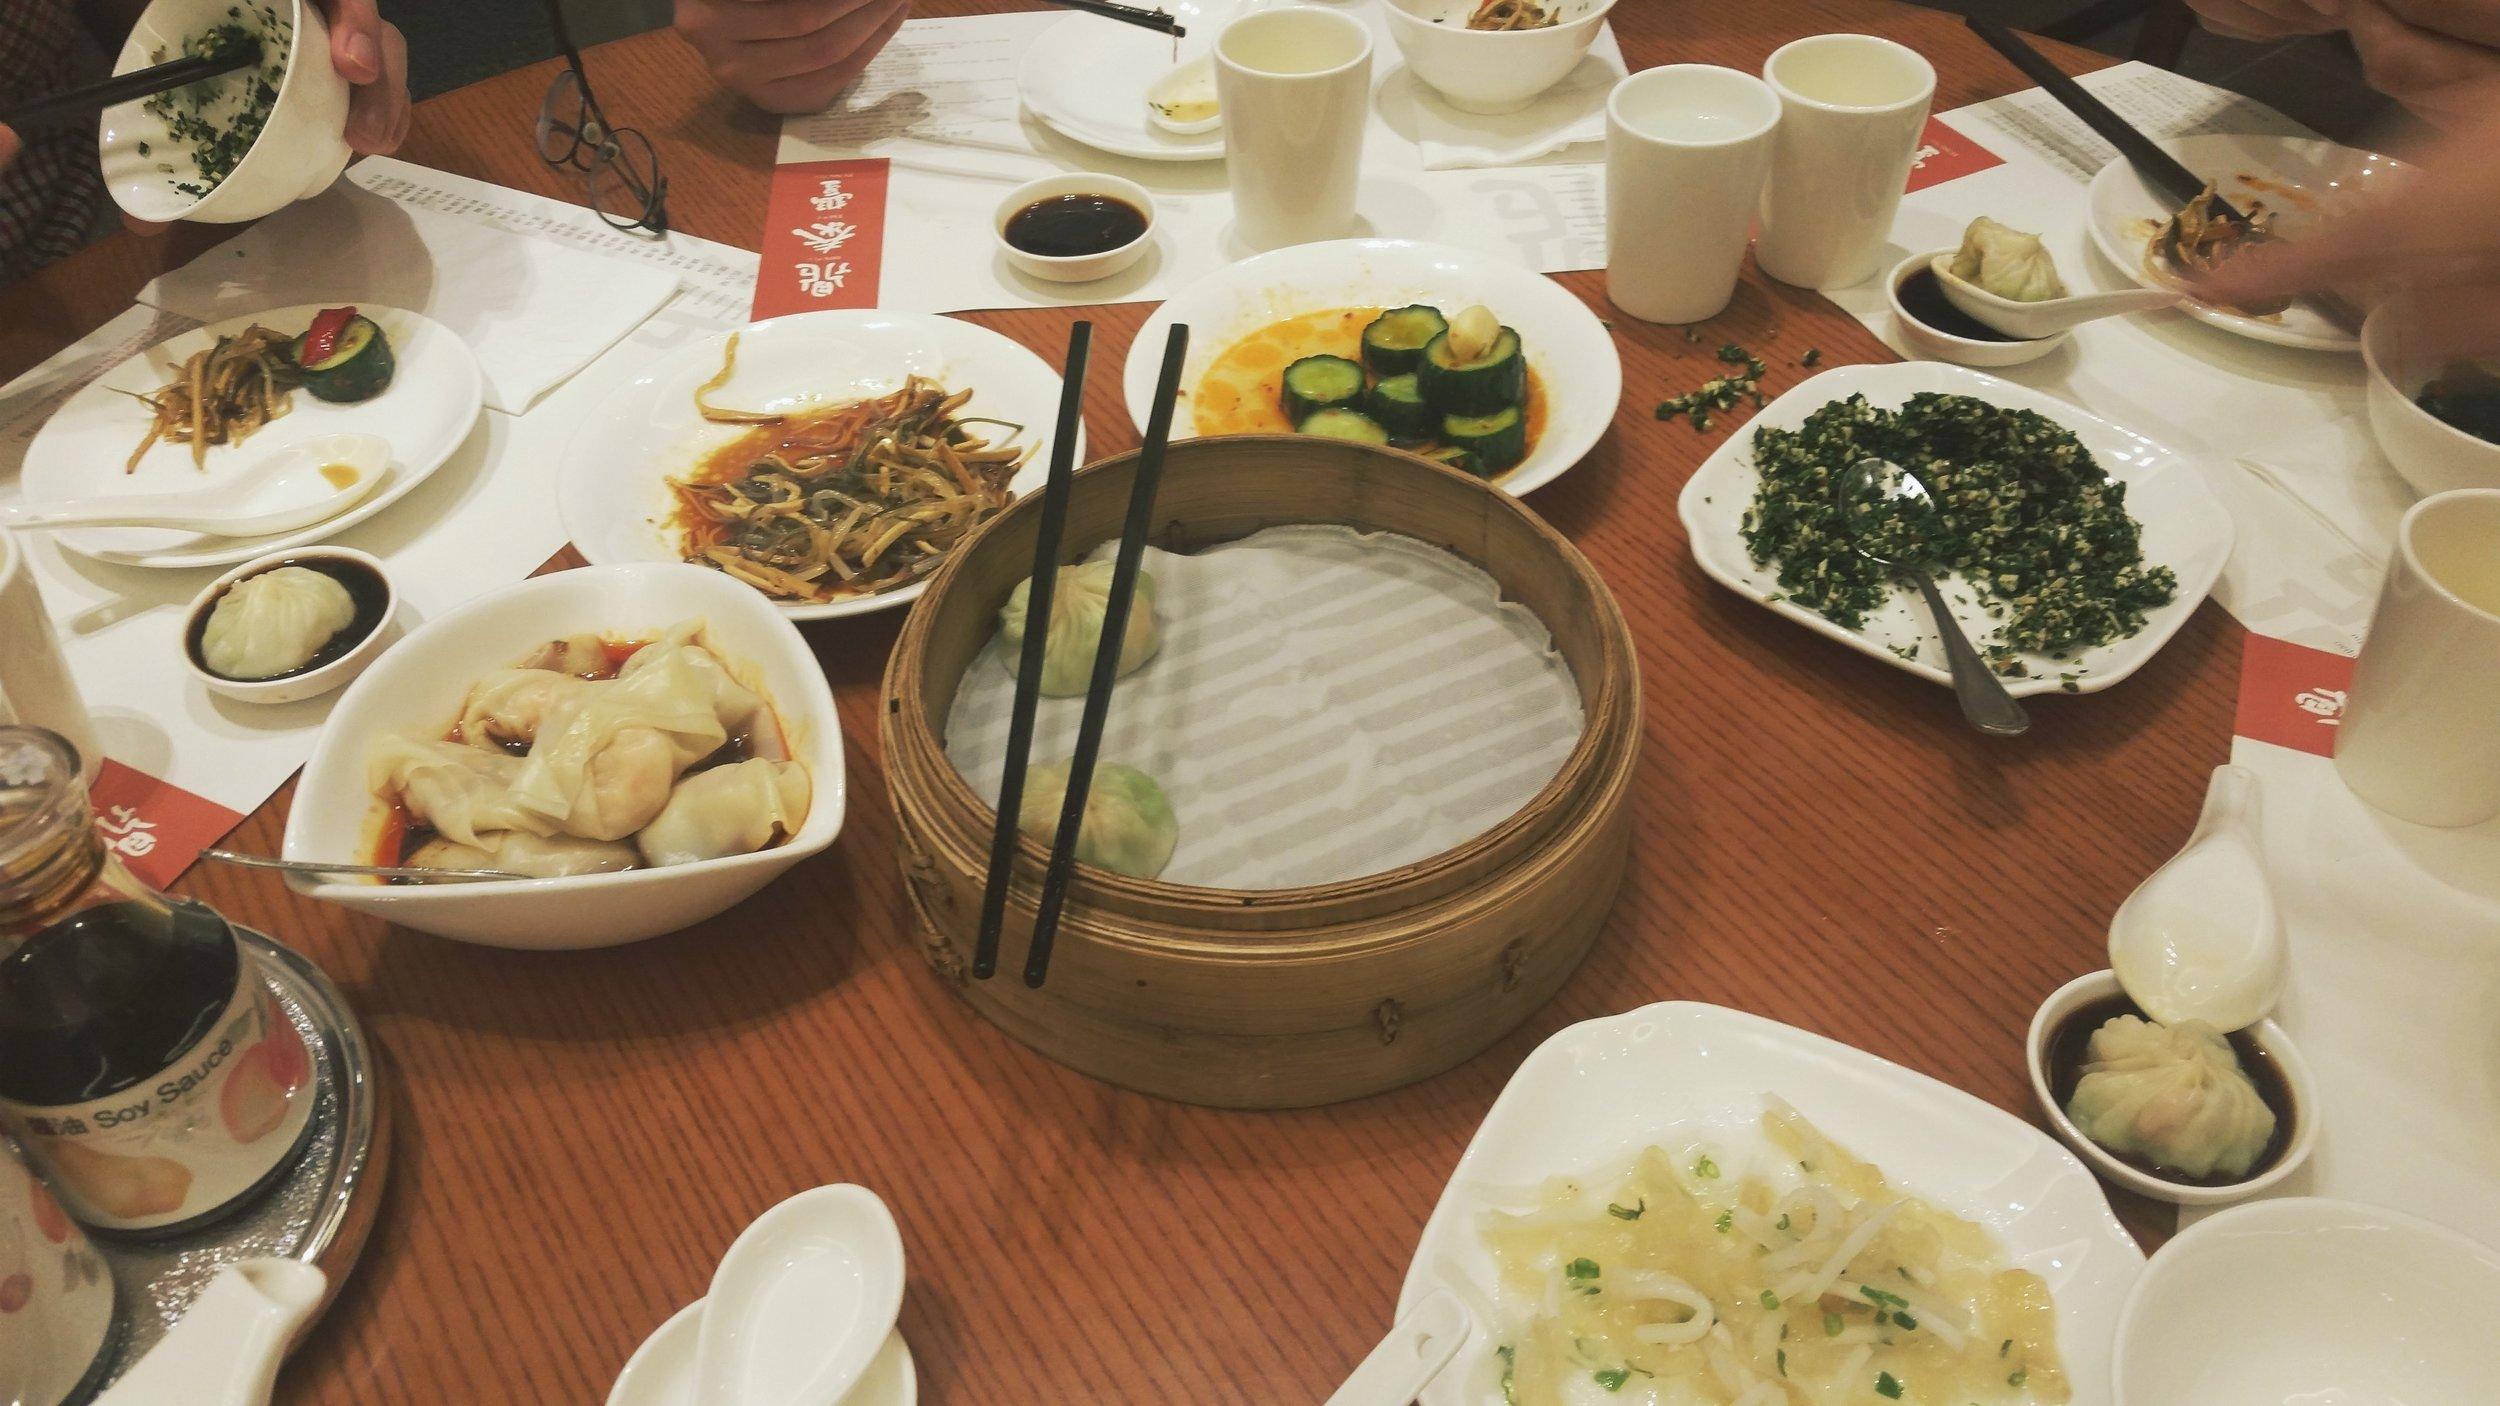 Taiwanese style dim sum. The pork and truffle dumplings were aaaaaaamazing.